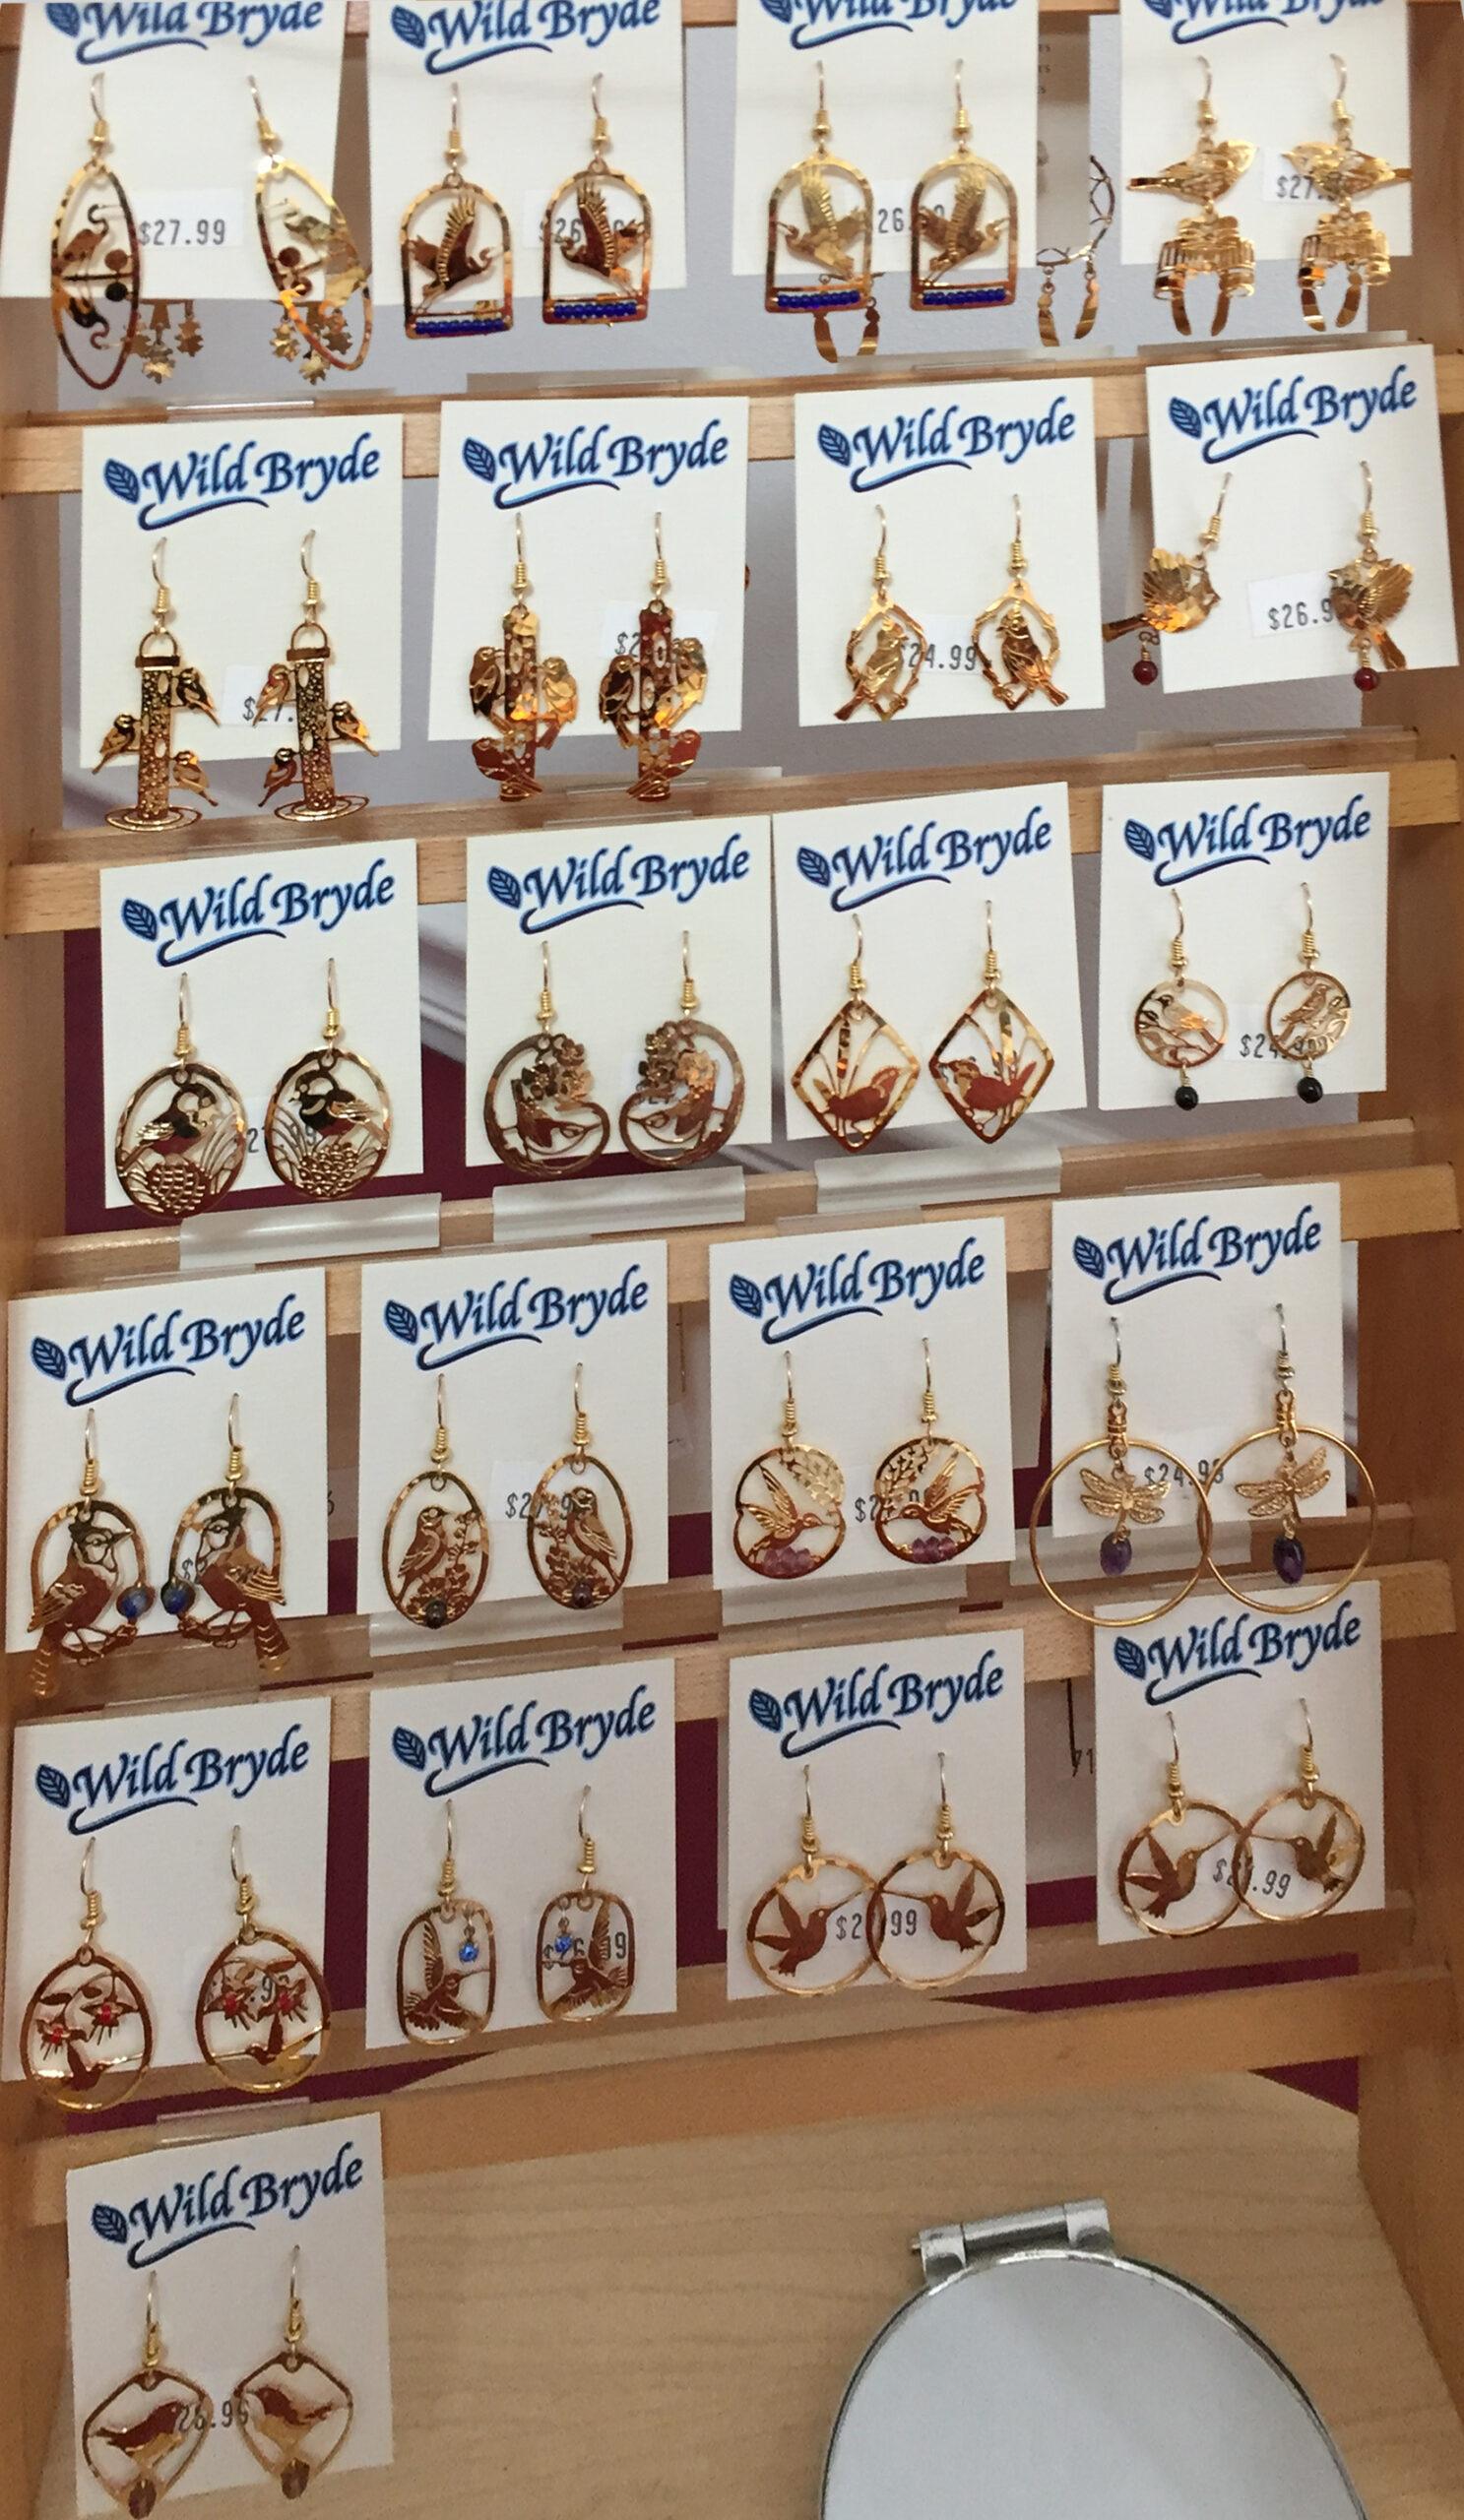 The Backyard Naturalist has Wild Bryde earrings for 2020 in stock.